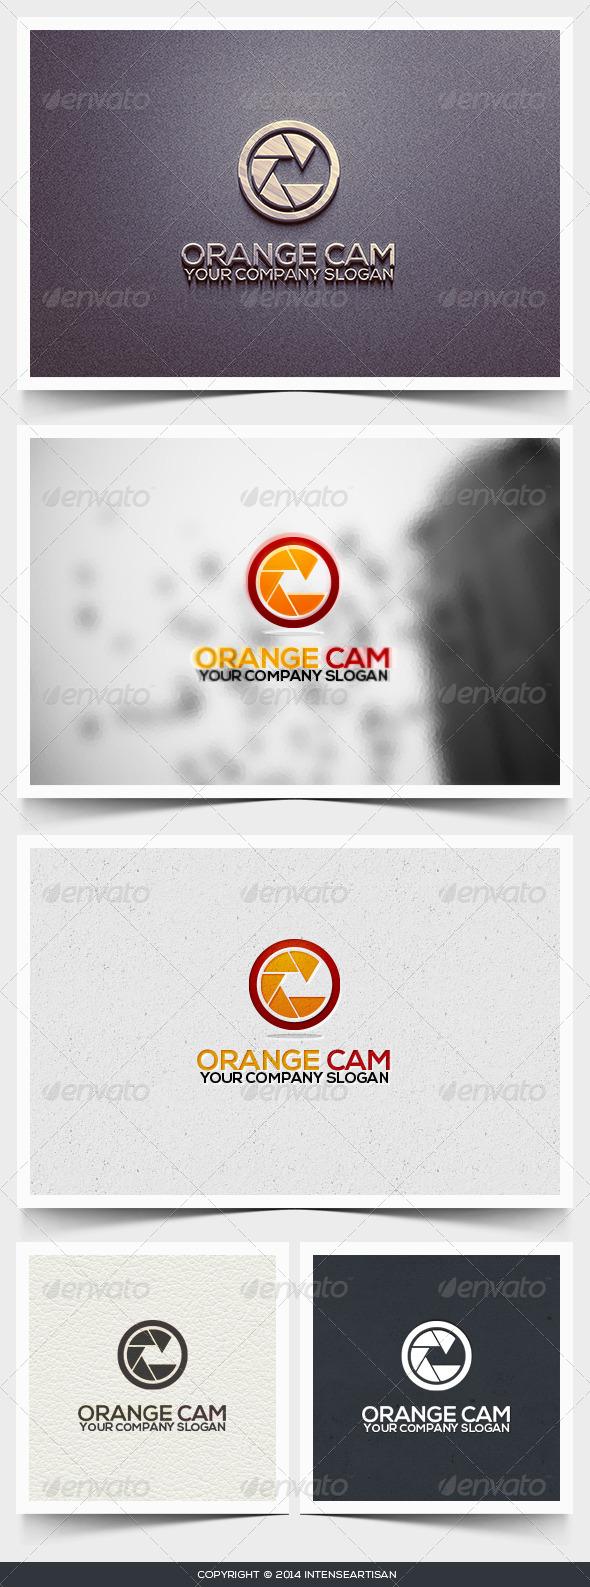 GraphicRiver Orange Cam Logo Template 6619146